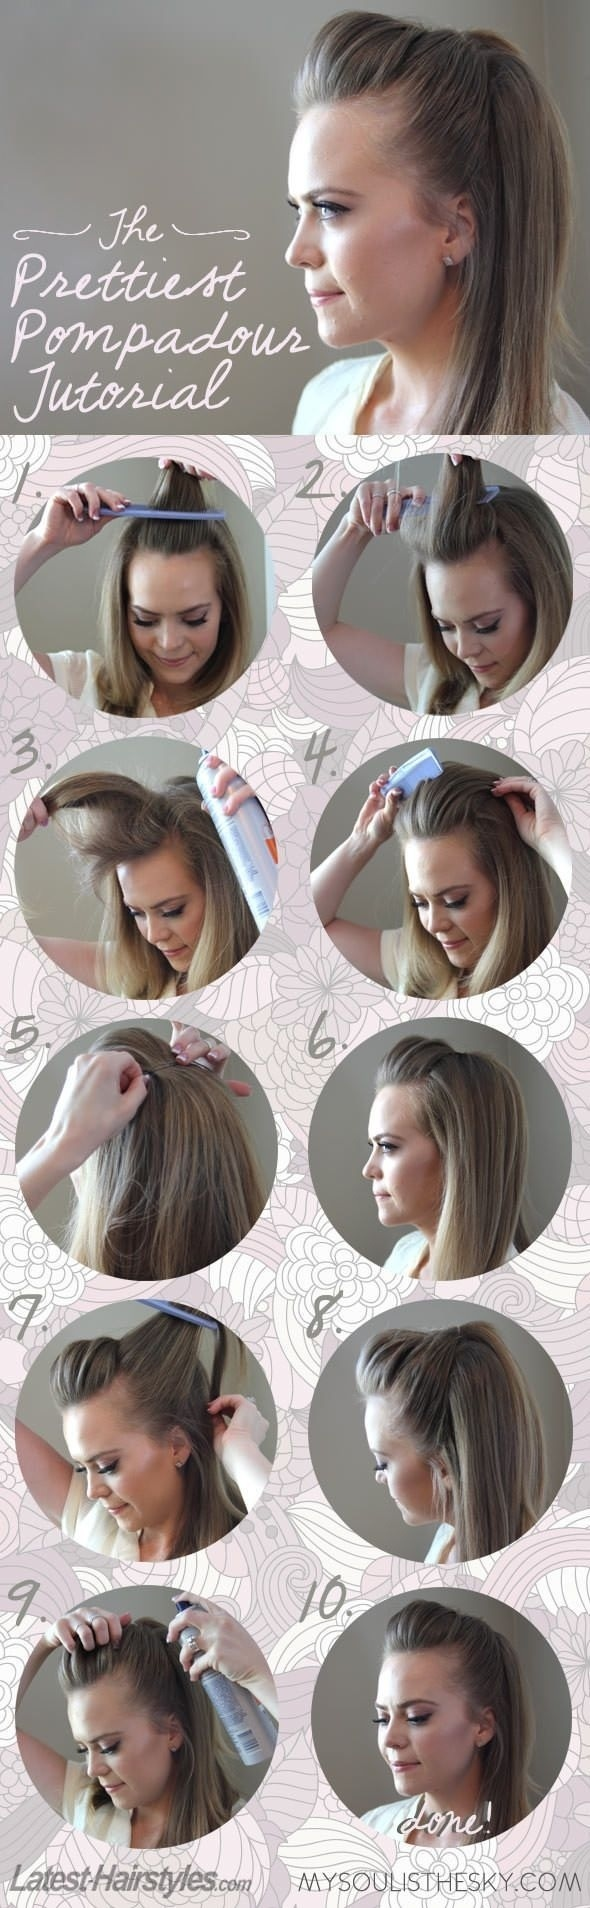 coiffures-express-16